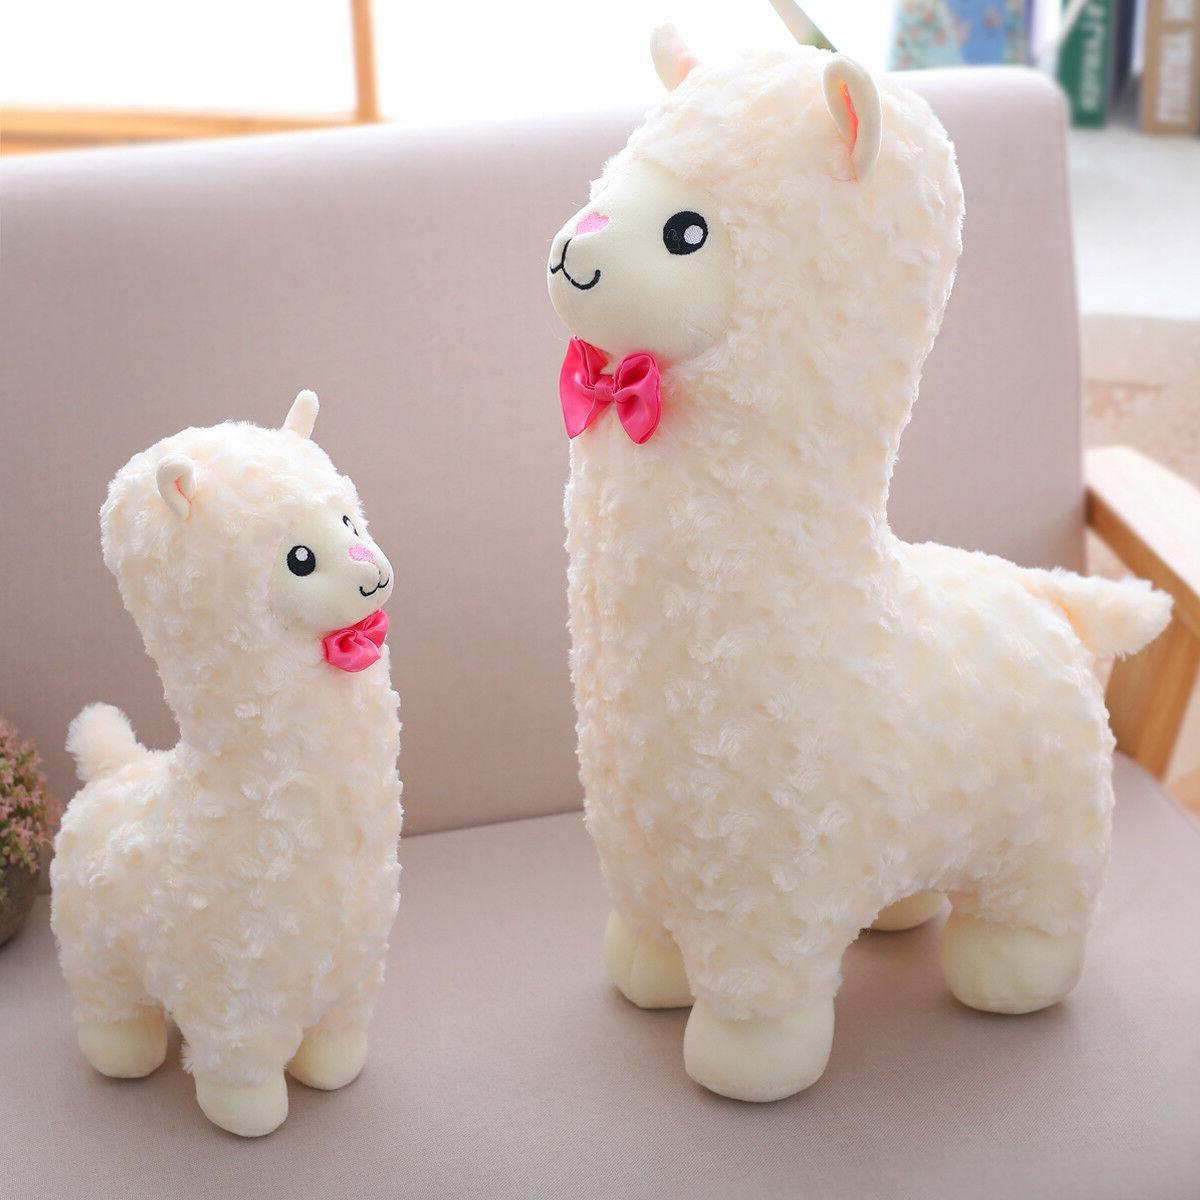 Winsterch Alpaca Cuddly